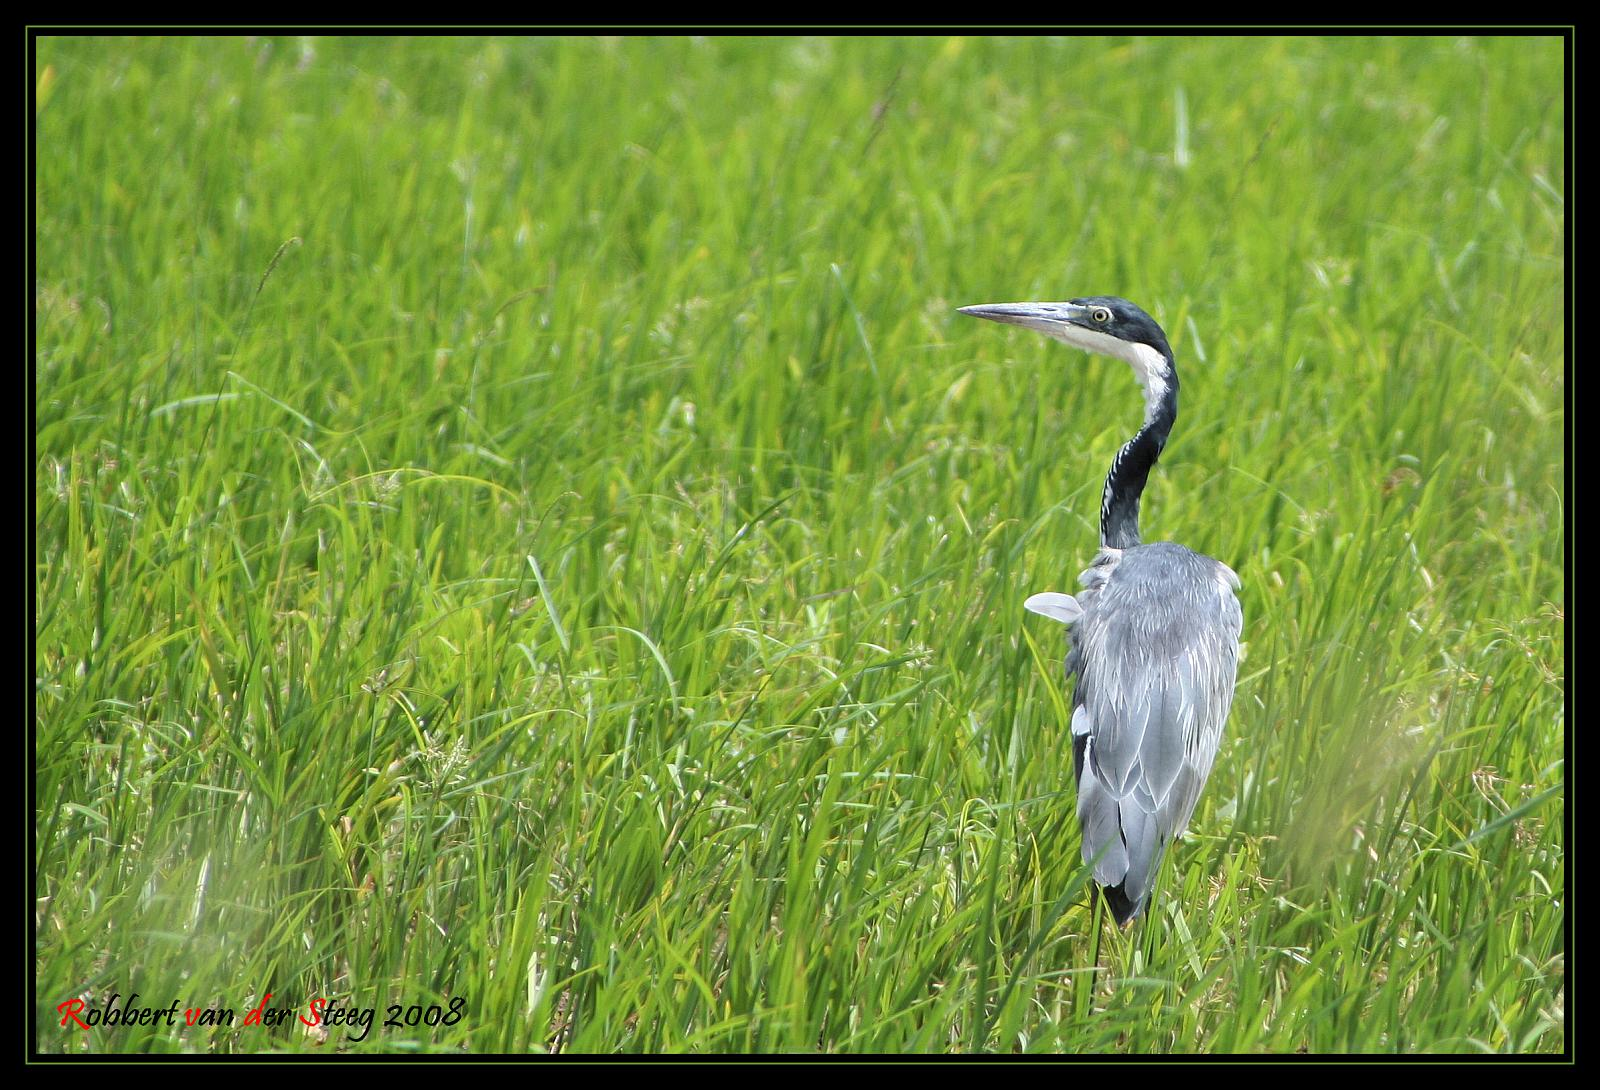 Black Headed Heron in a Somali rice field